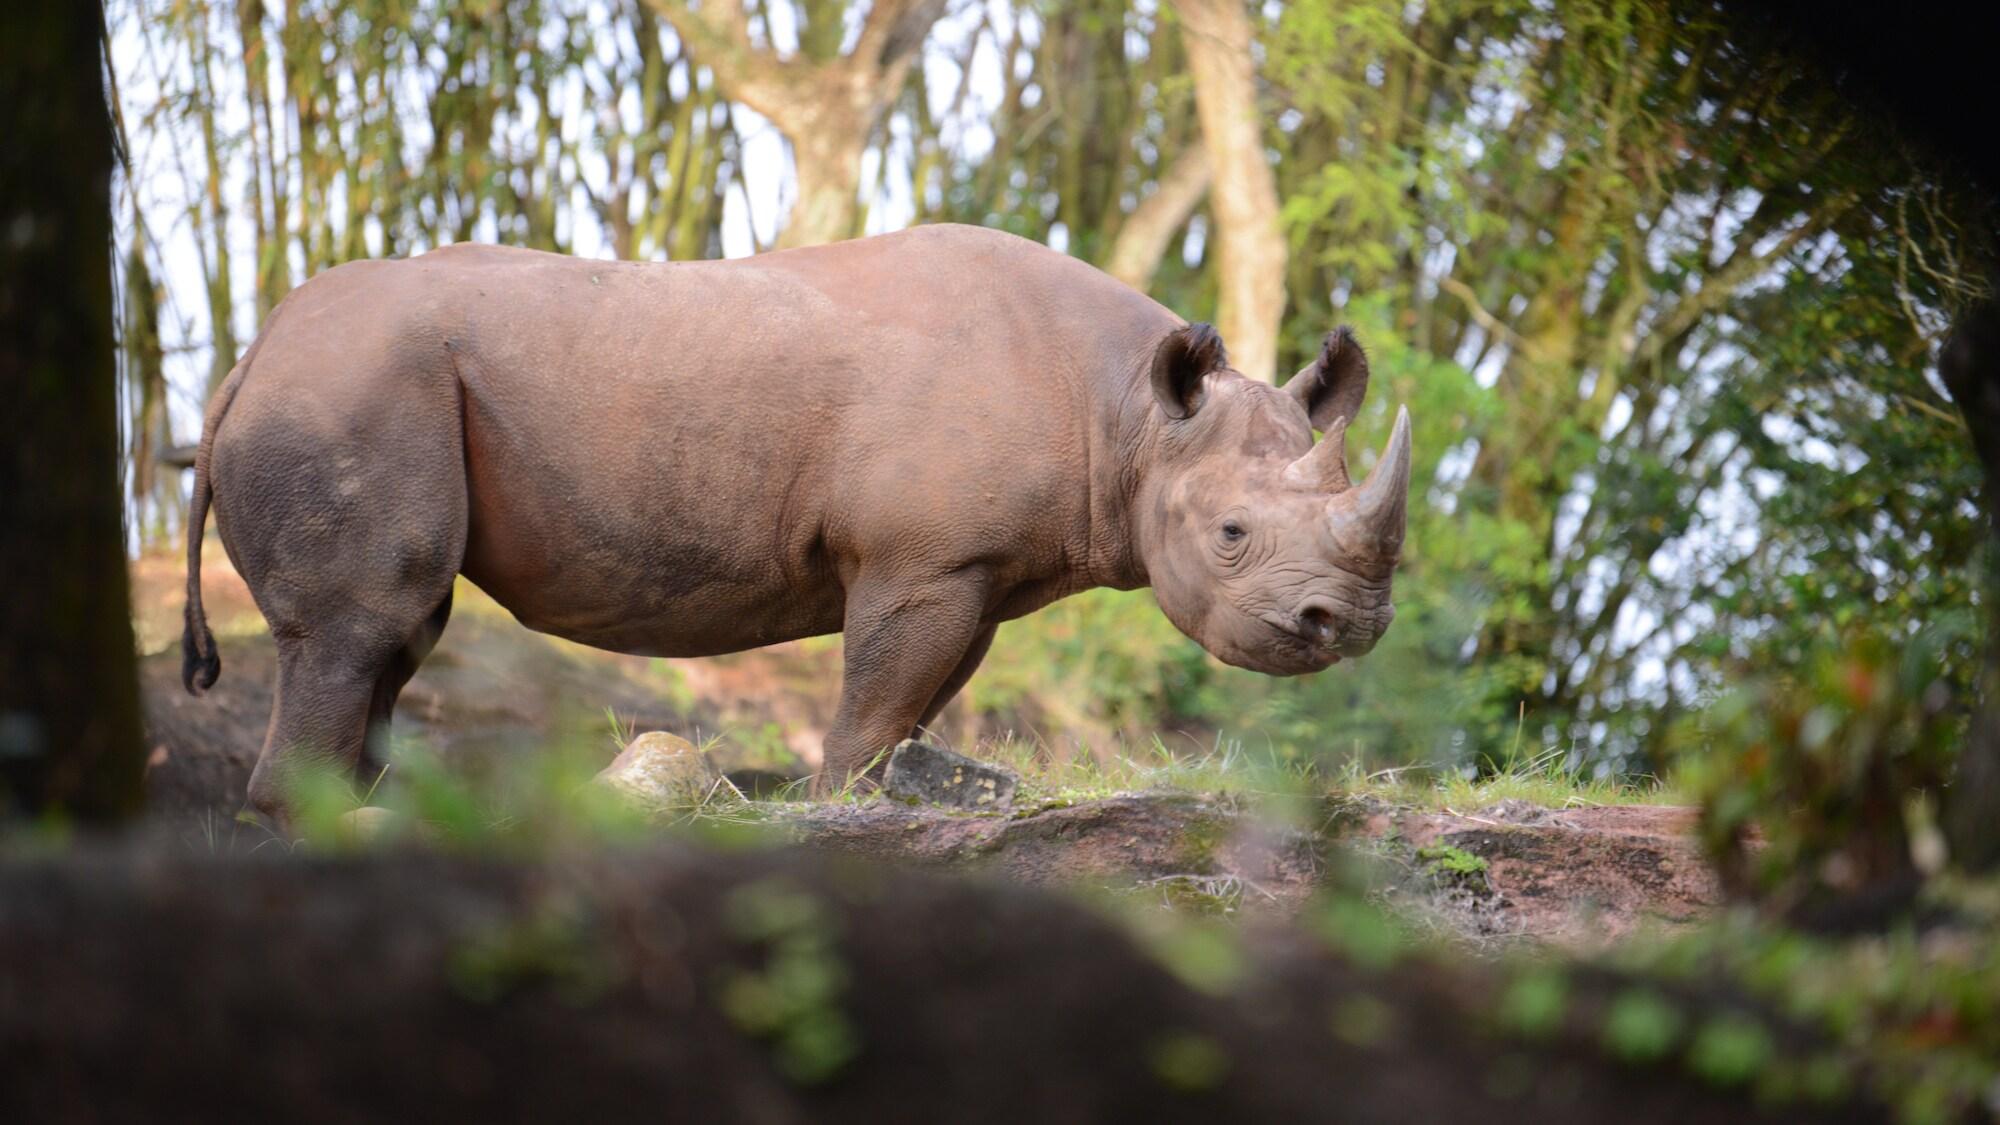 Black Rhino at Kilimanjaro Safari. (National Geographic/Gene Page)